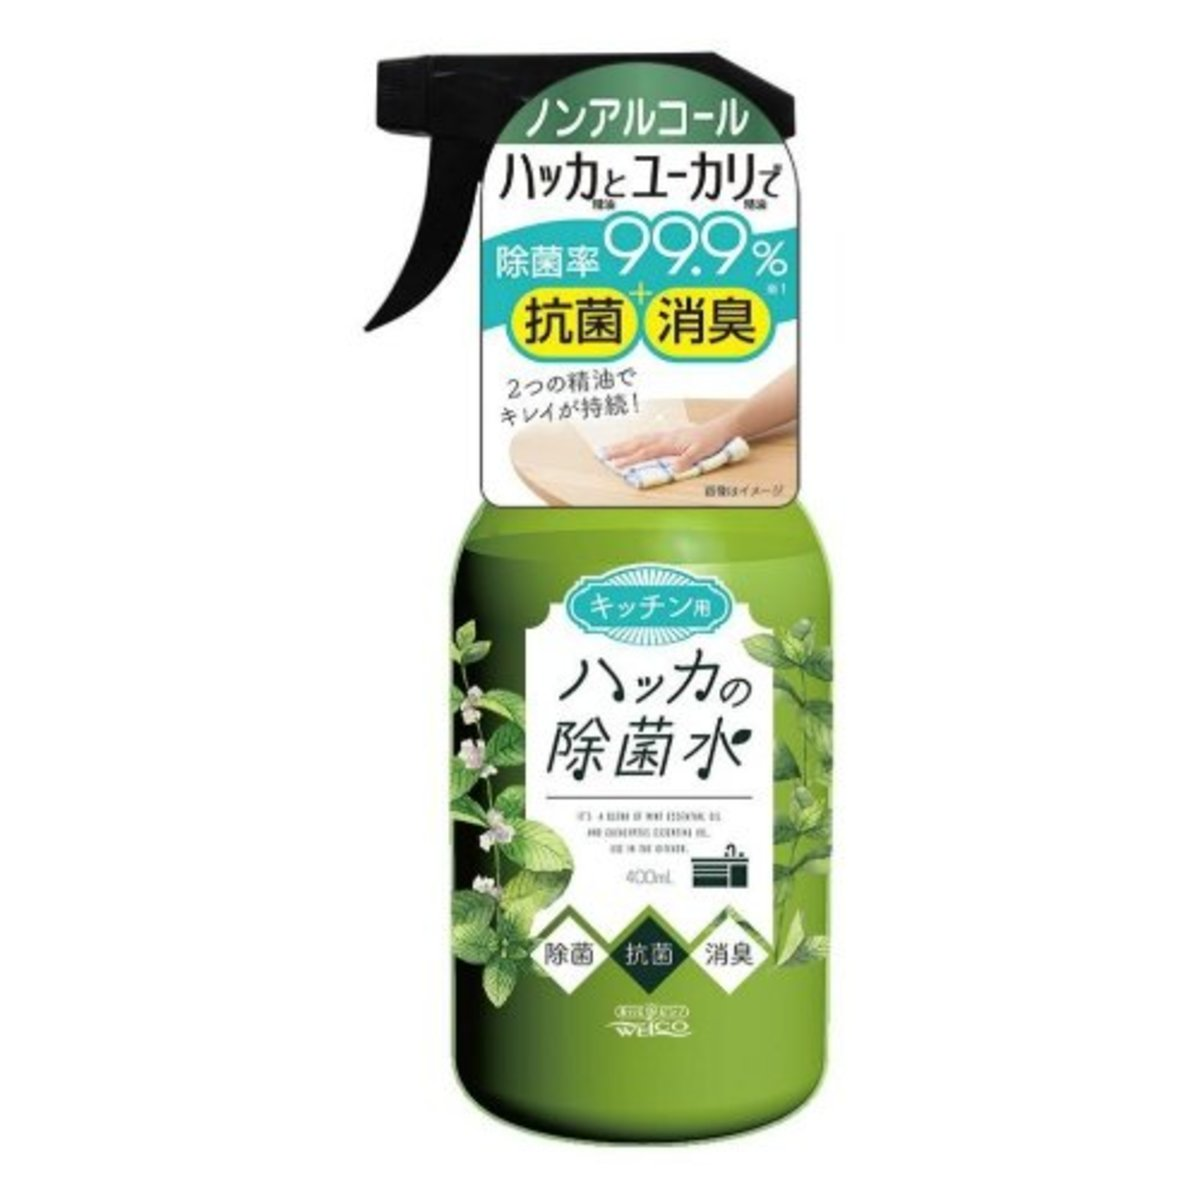 Peppermint Sterilizing Water 400ml (Made in Japan)